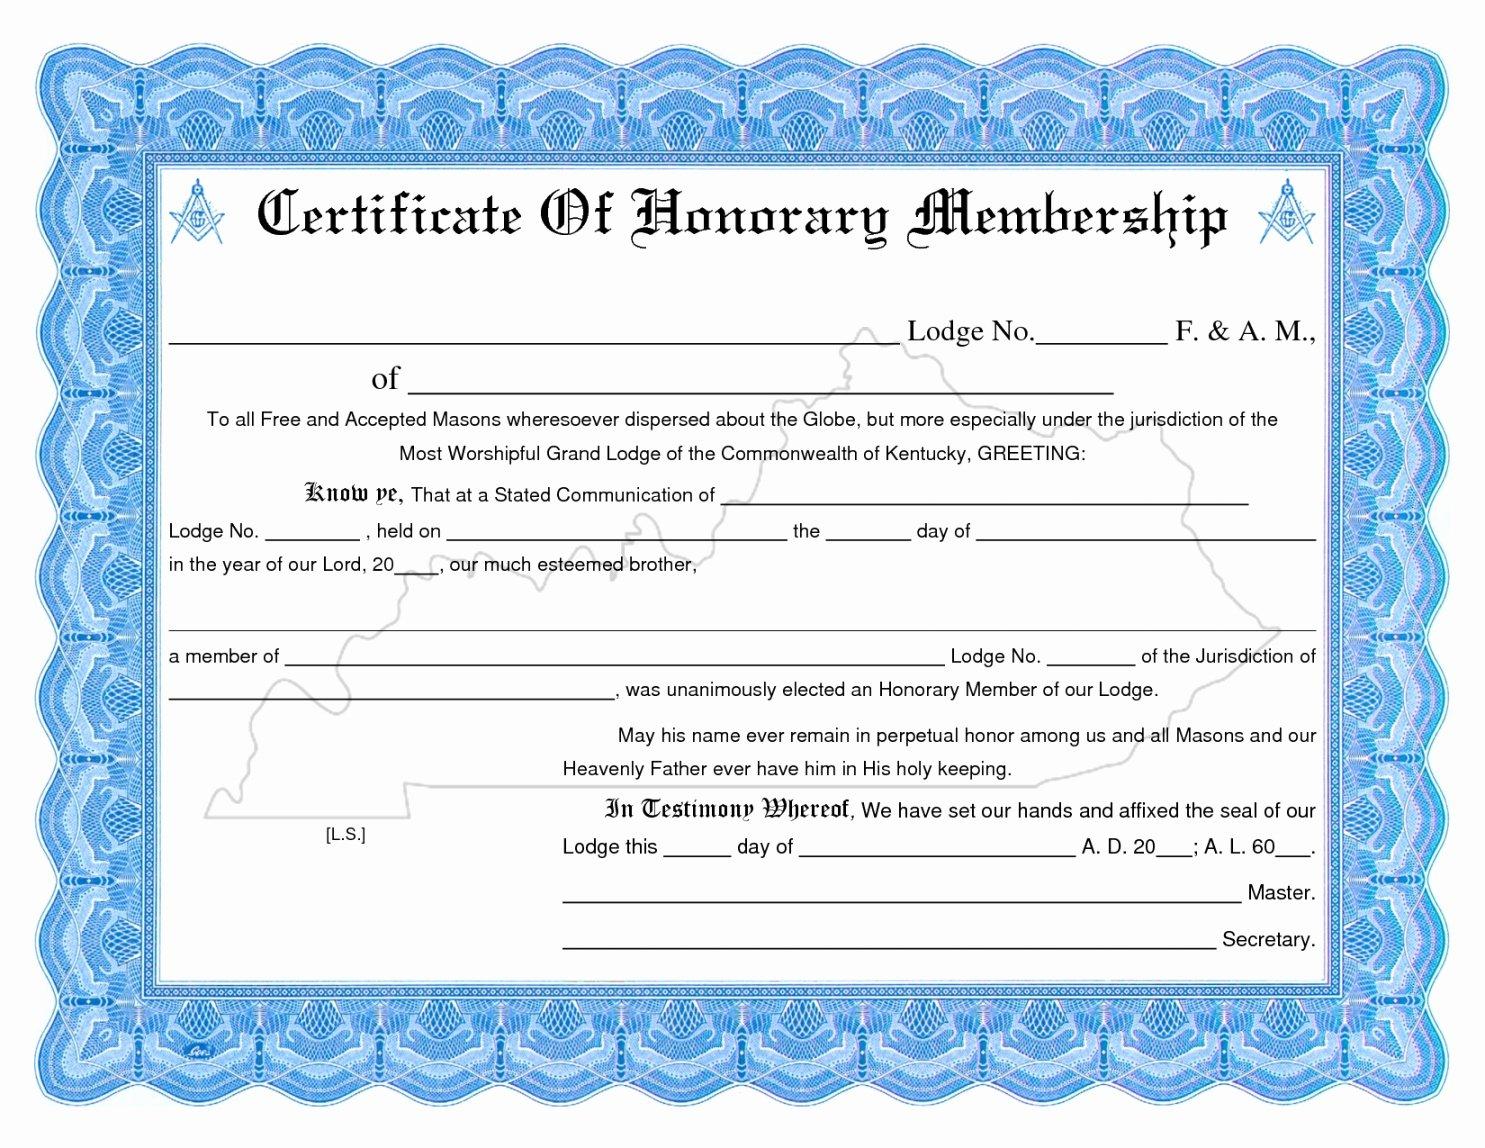 Membership Certificate Llc Template Awesome Editable Membership Certificate Template Llc New Church